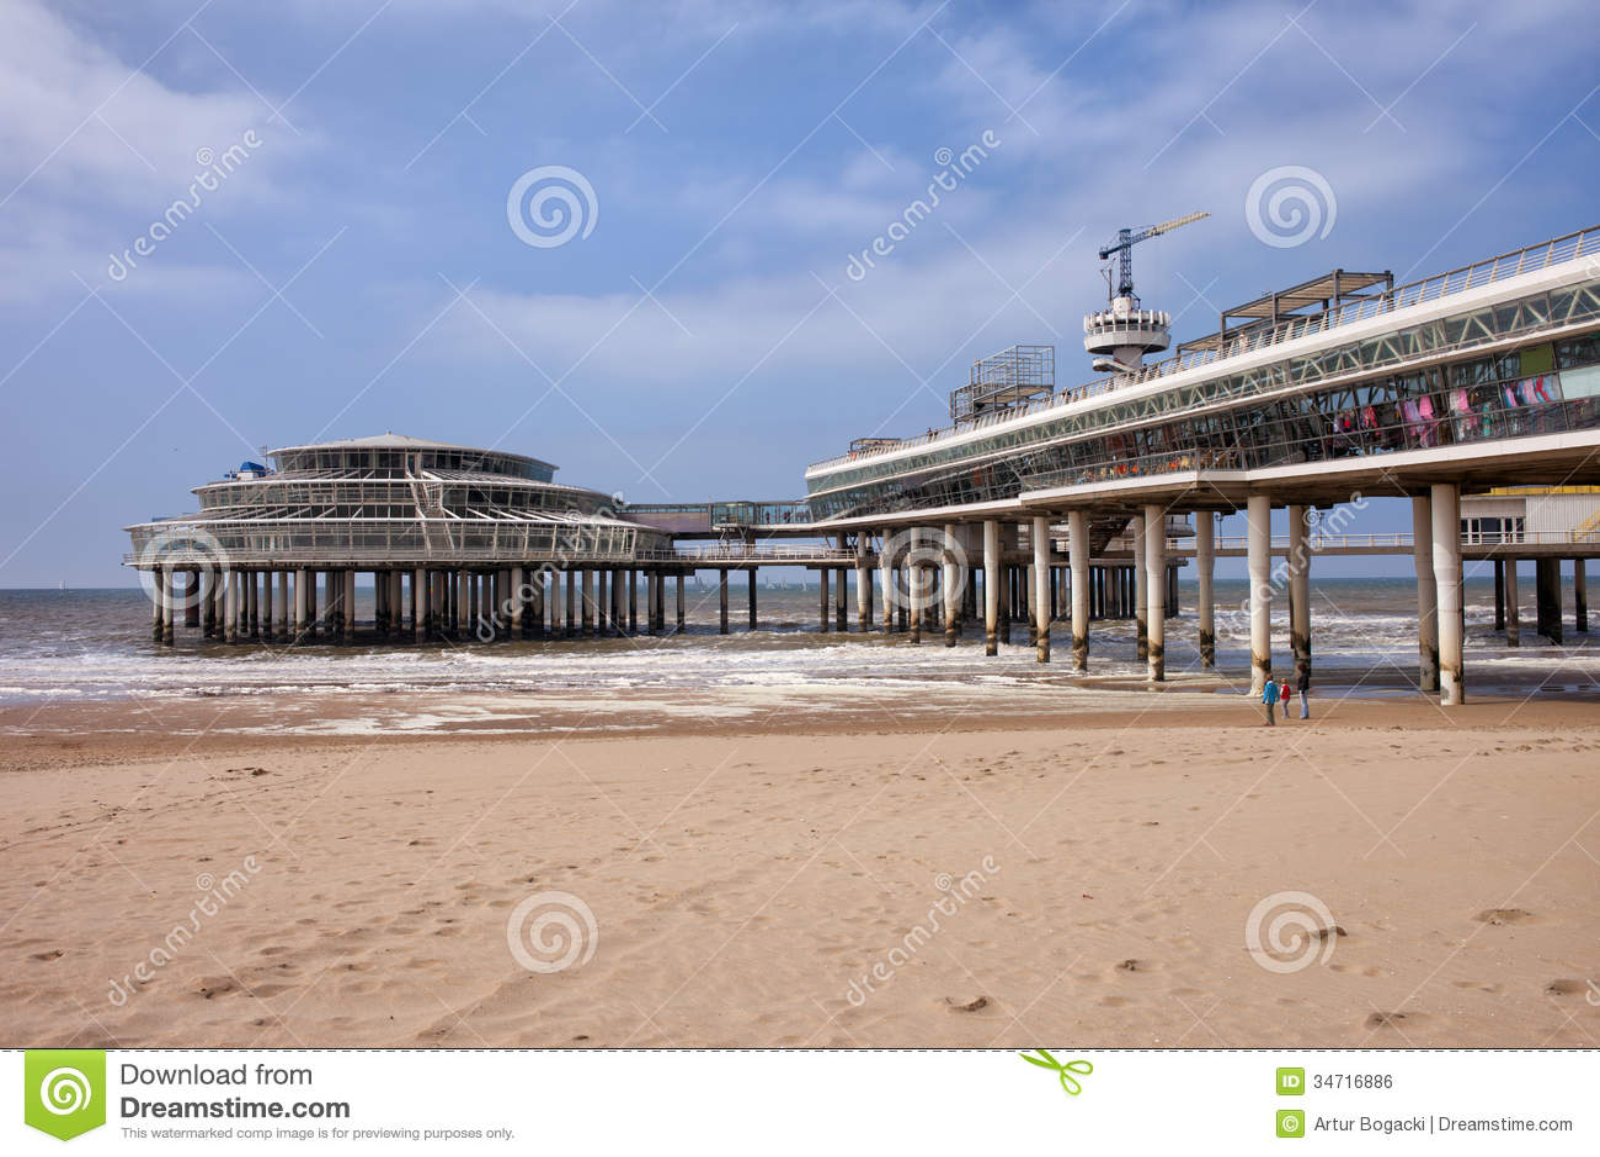 Scheveningen Beach And Pier In Hague Stock Photo Image